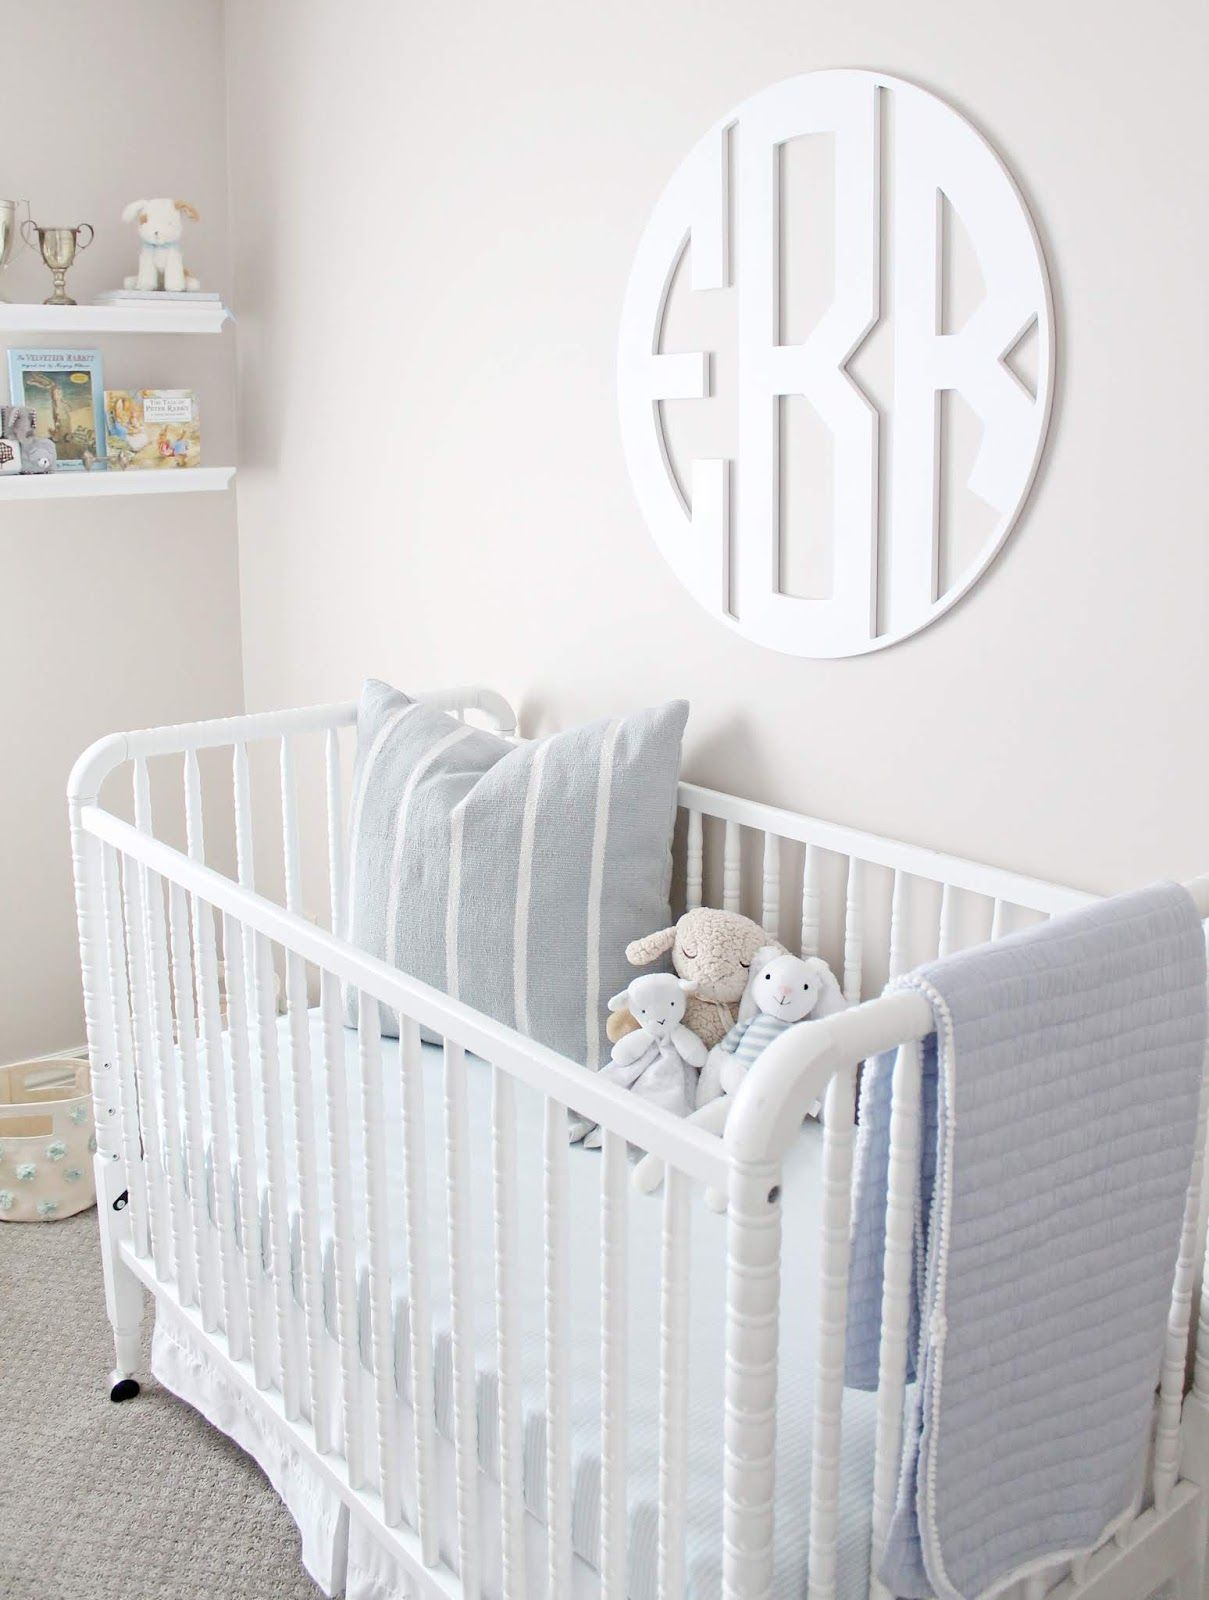 Nursery Reveal! (A Classic Baby Boy Nursery) images